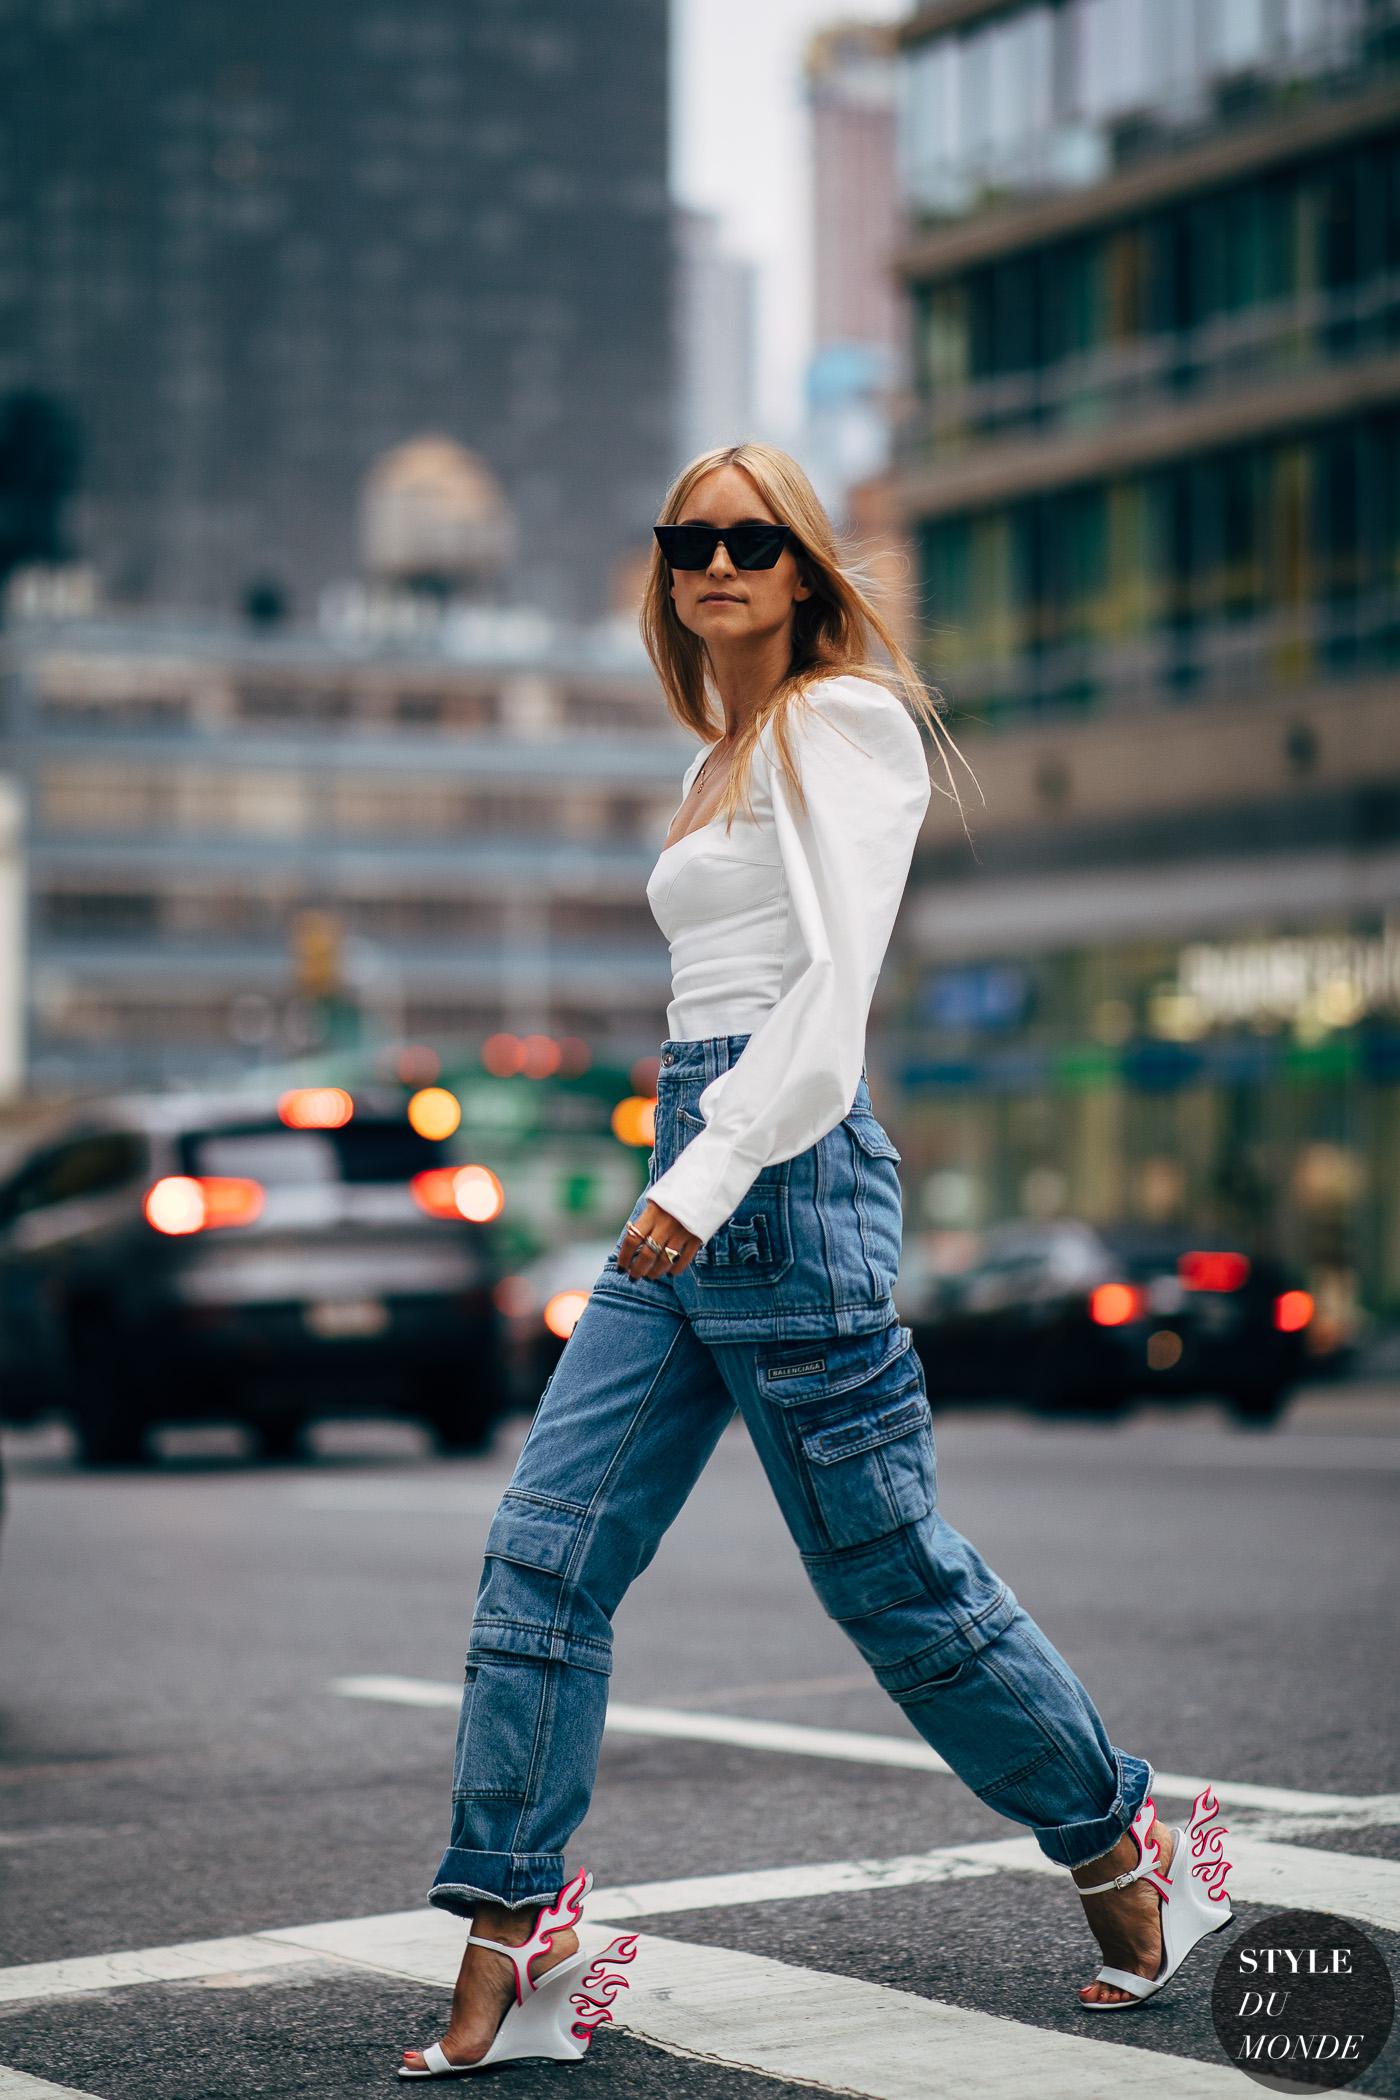 giày cao gót tia lửa prada áo blouse quần jeans